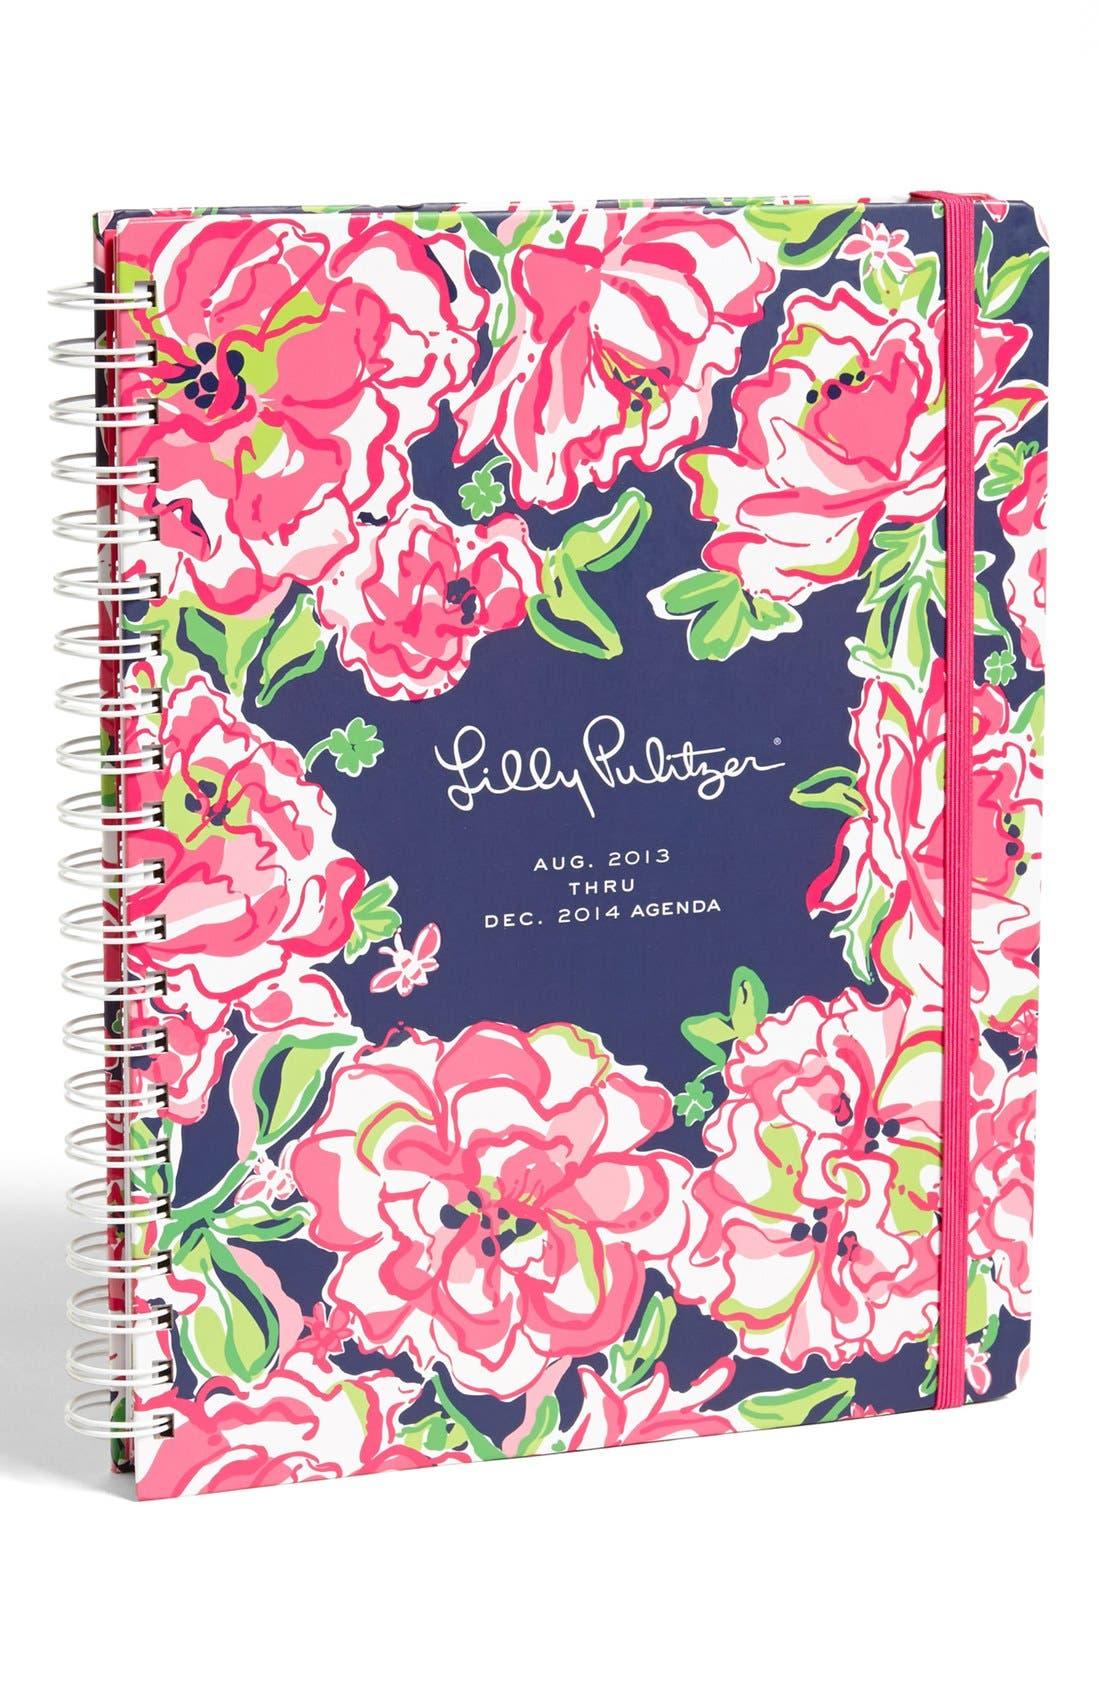 Alternate Image 1 Selected - Lilly Pulitzer® Floral Print Jumbo Agenda